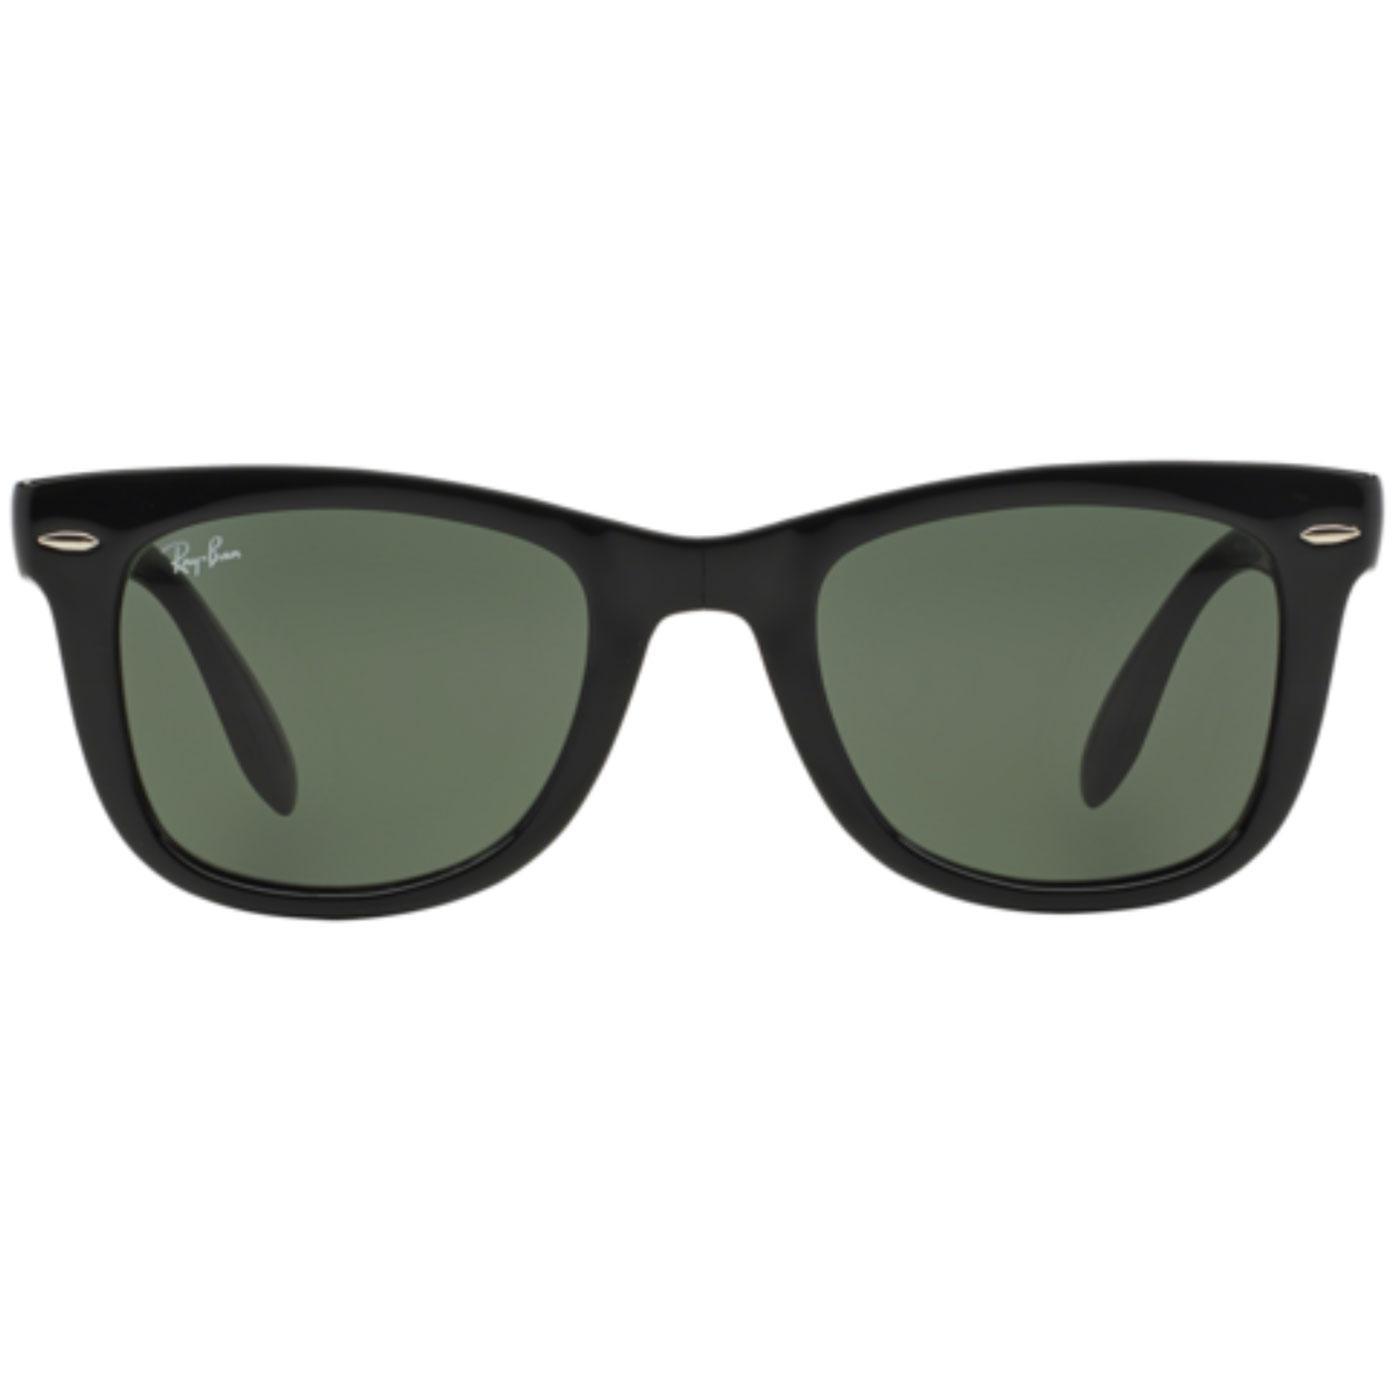 fold away ray ban wayfarer sunglasses